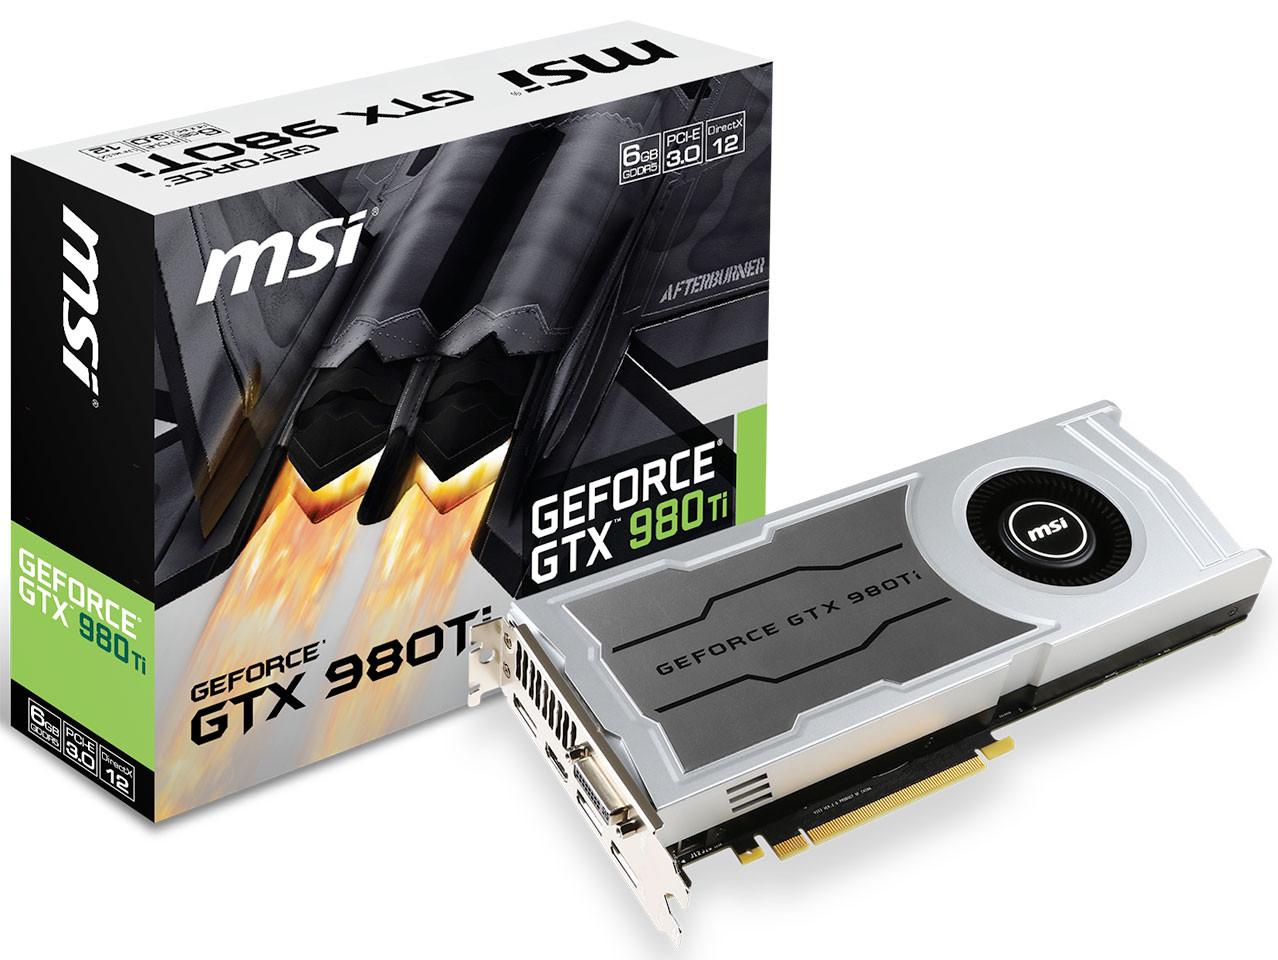 Photo of MSI presenta la GeForce GTX 980 Ti V1